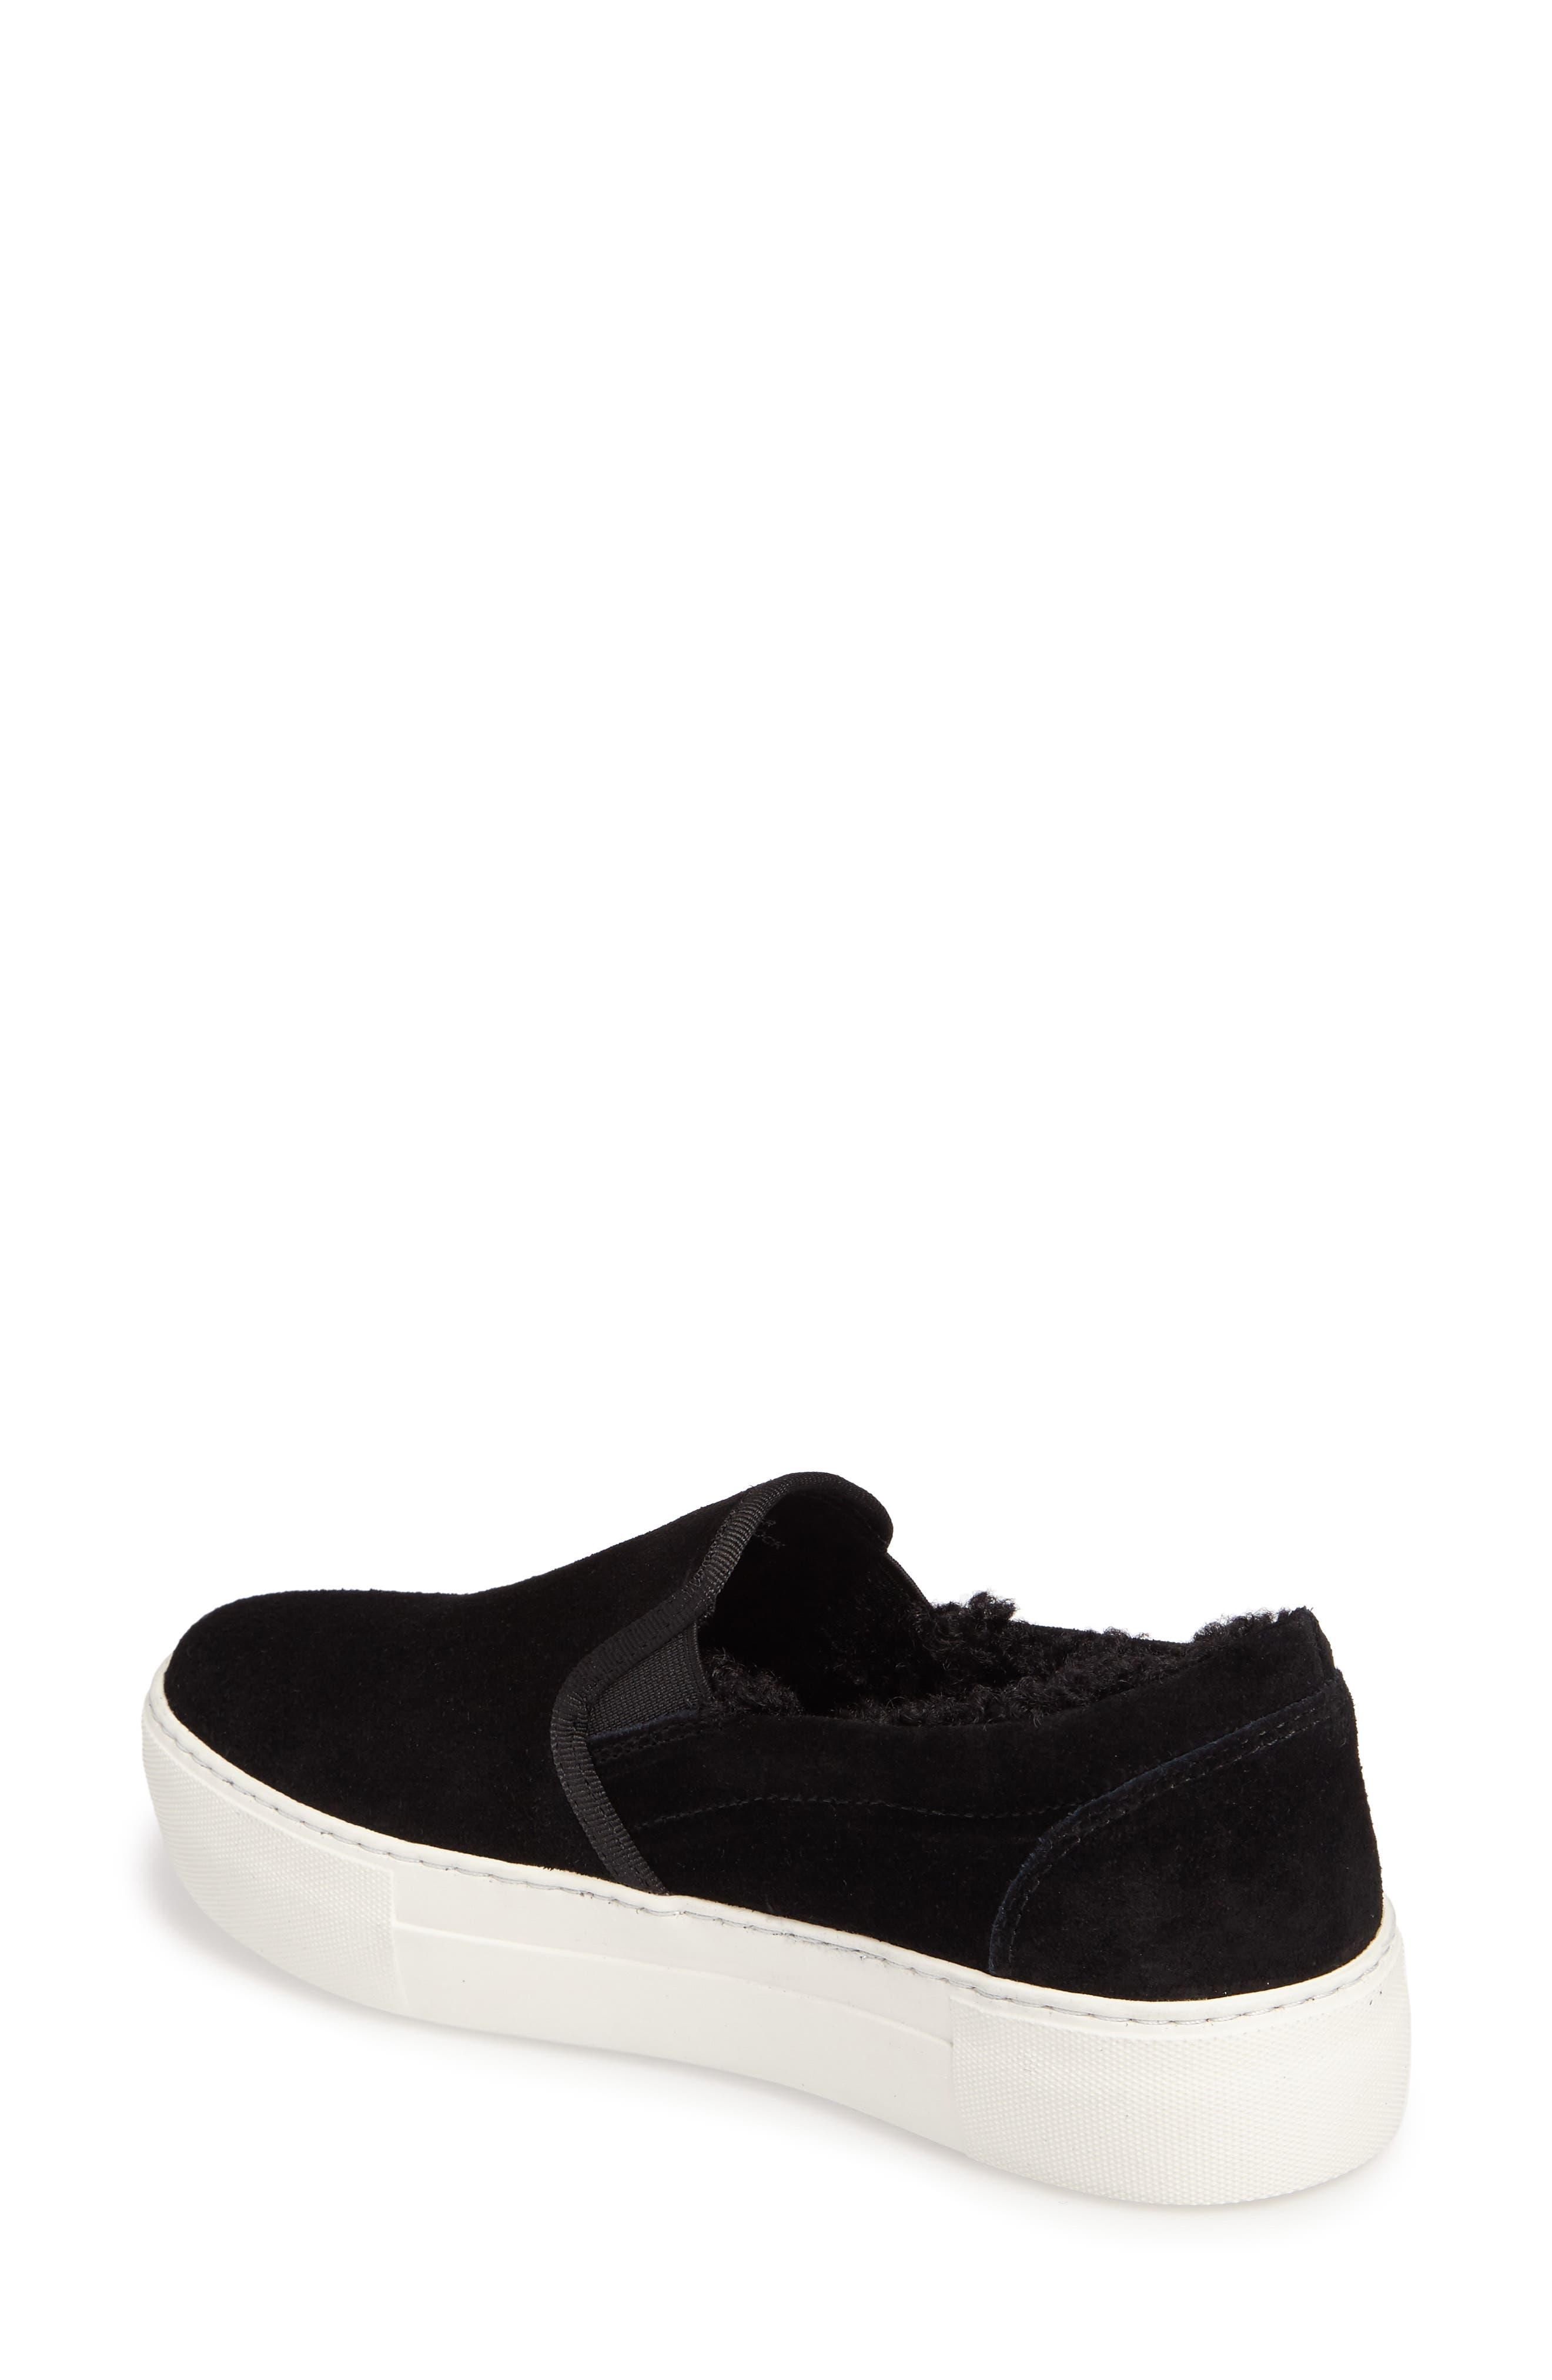 Arpel Faux Fur Lined Slip-On Sneaker,                             Alternate thumbnail 2, color,                             Black Suede